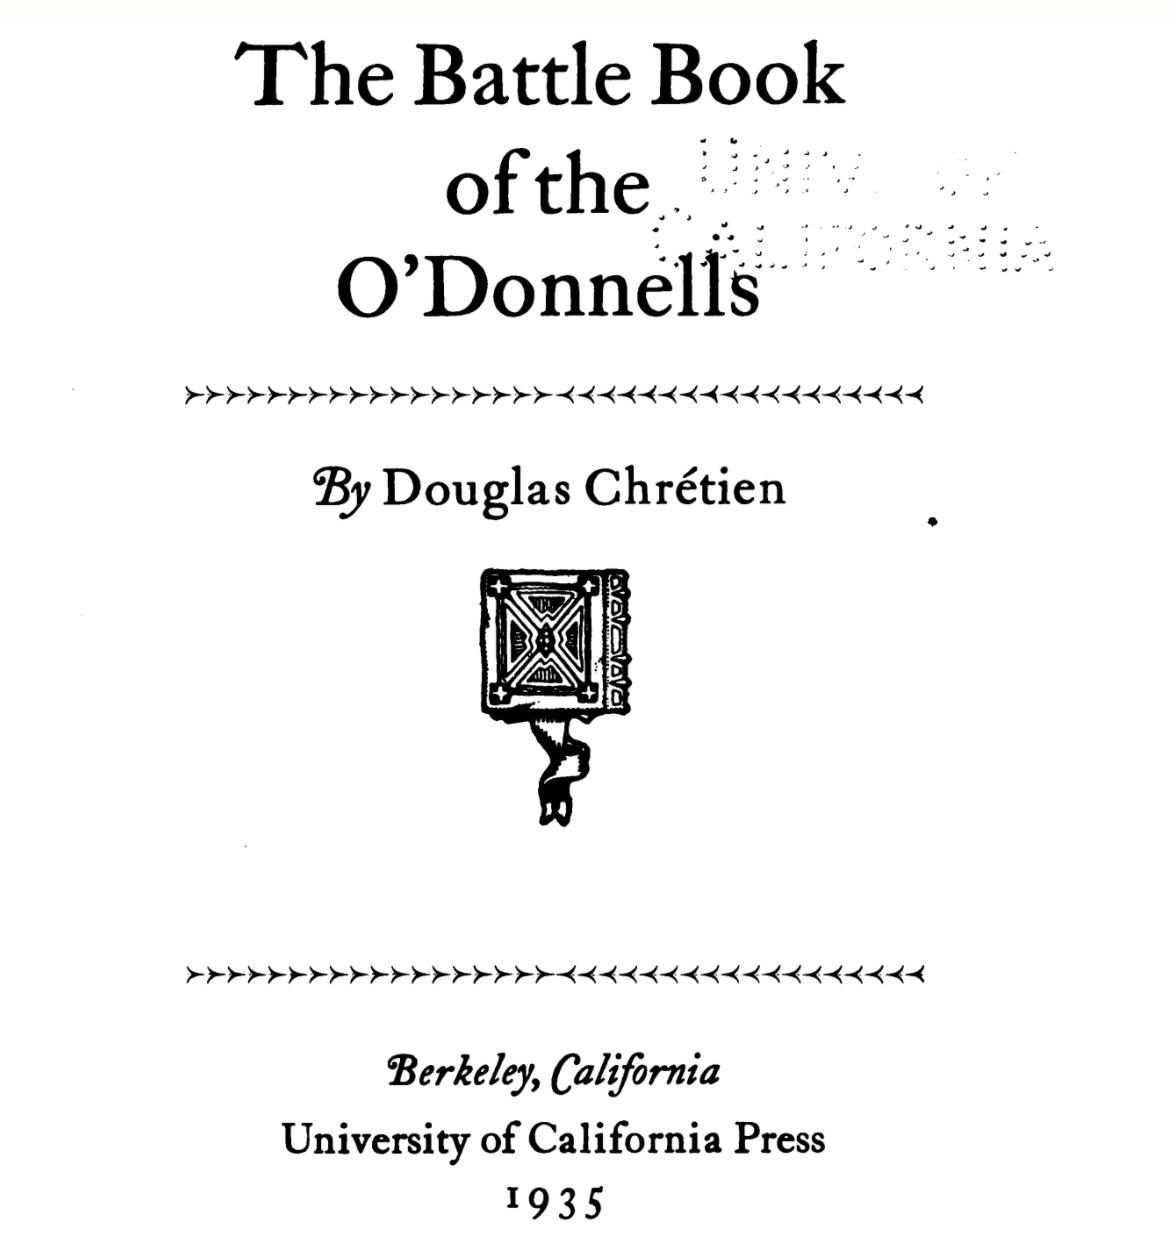 """The Battle Book of the O'Donnells"" by C. Douglas Chrétien"